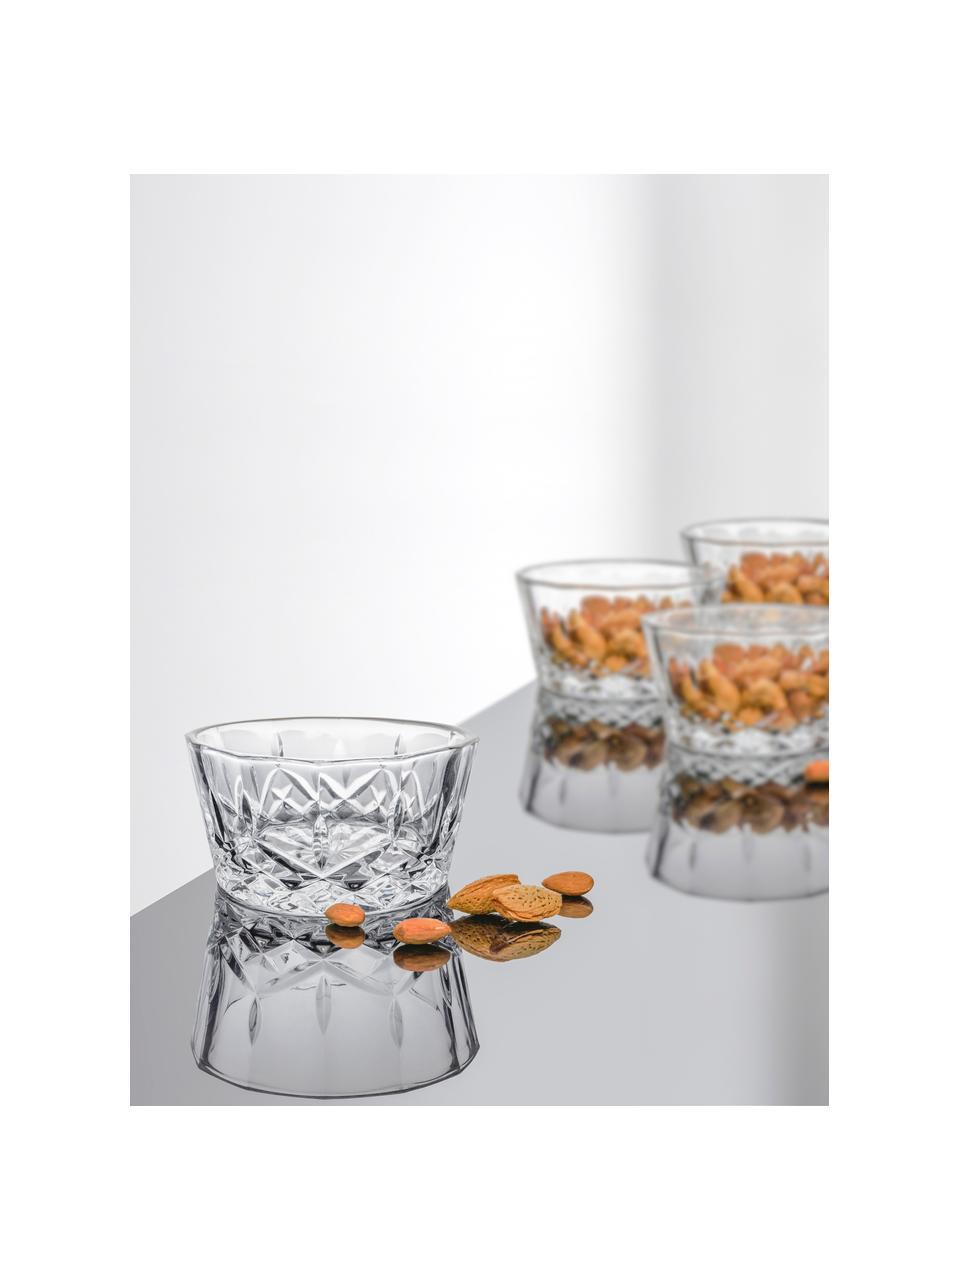 Glazen dipschalen Harvey met kristalreliëf, 4 stuks, Glas, Transparant, Ø 11 cm x H 6 cm